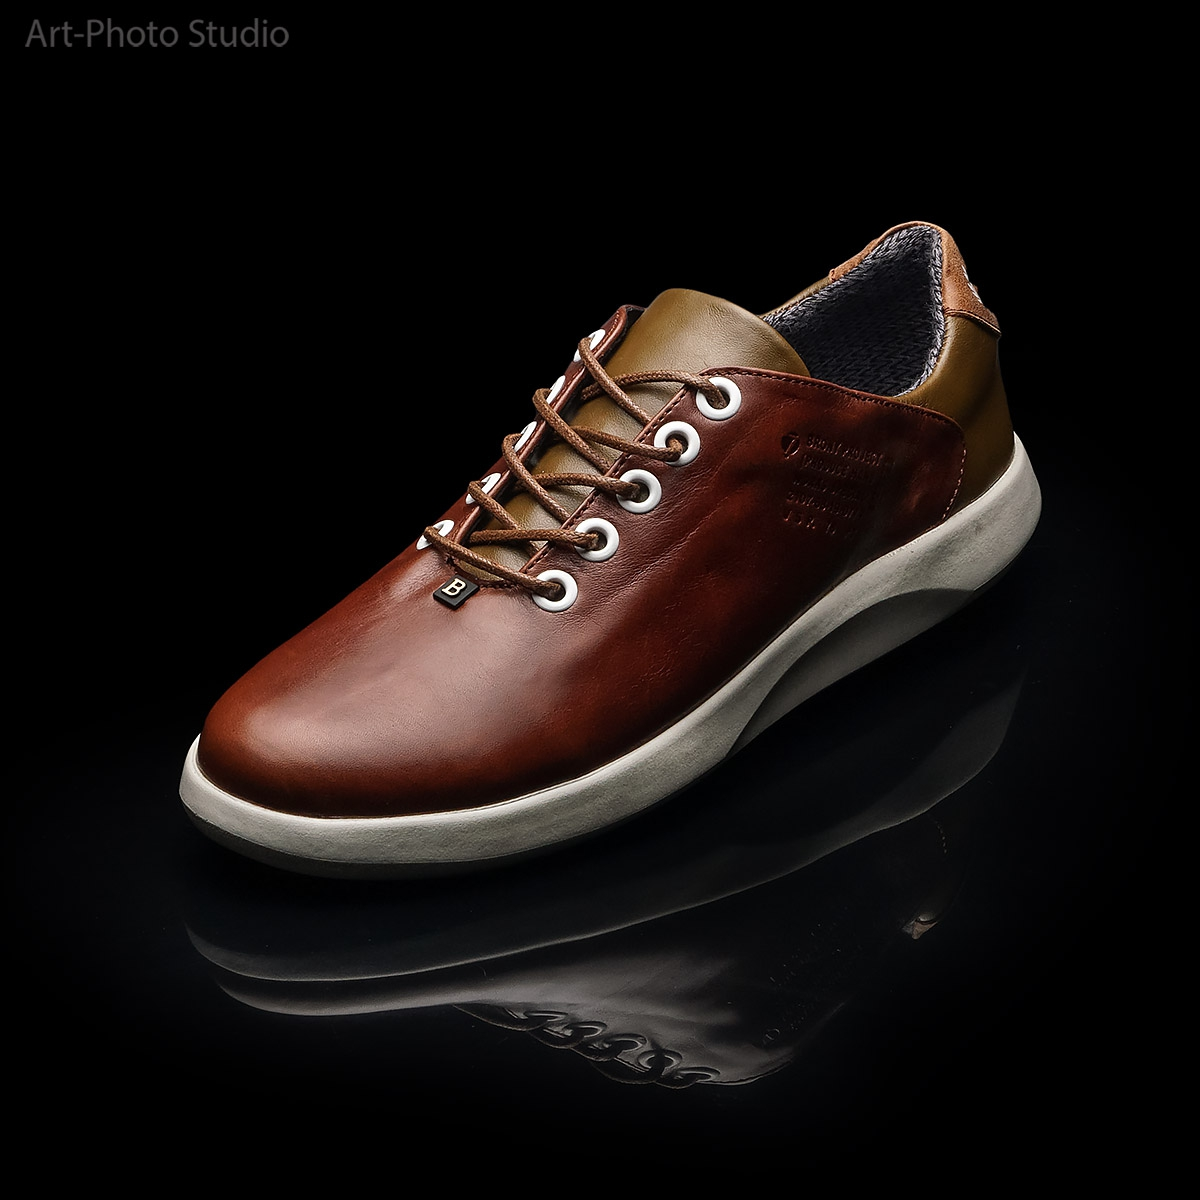 фото мужской обуви  для рекламного каталога